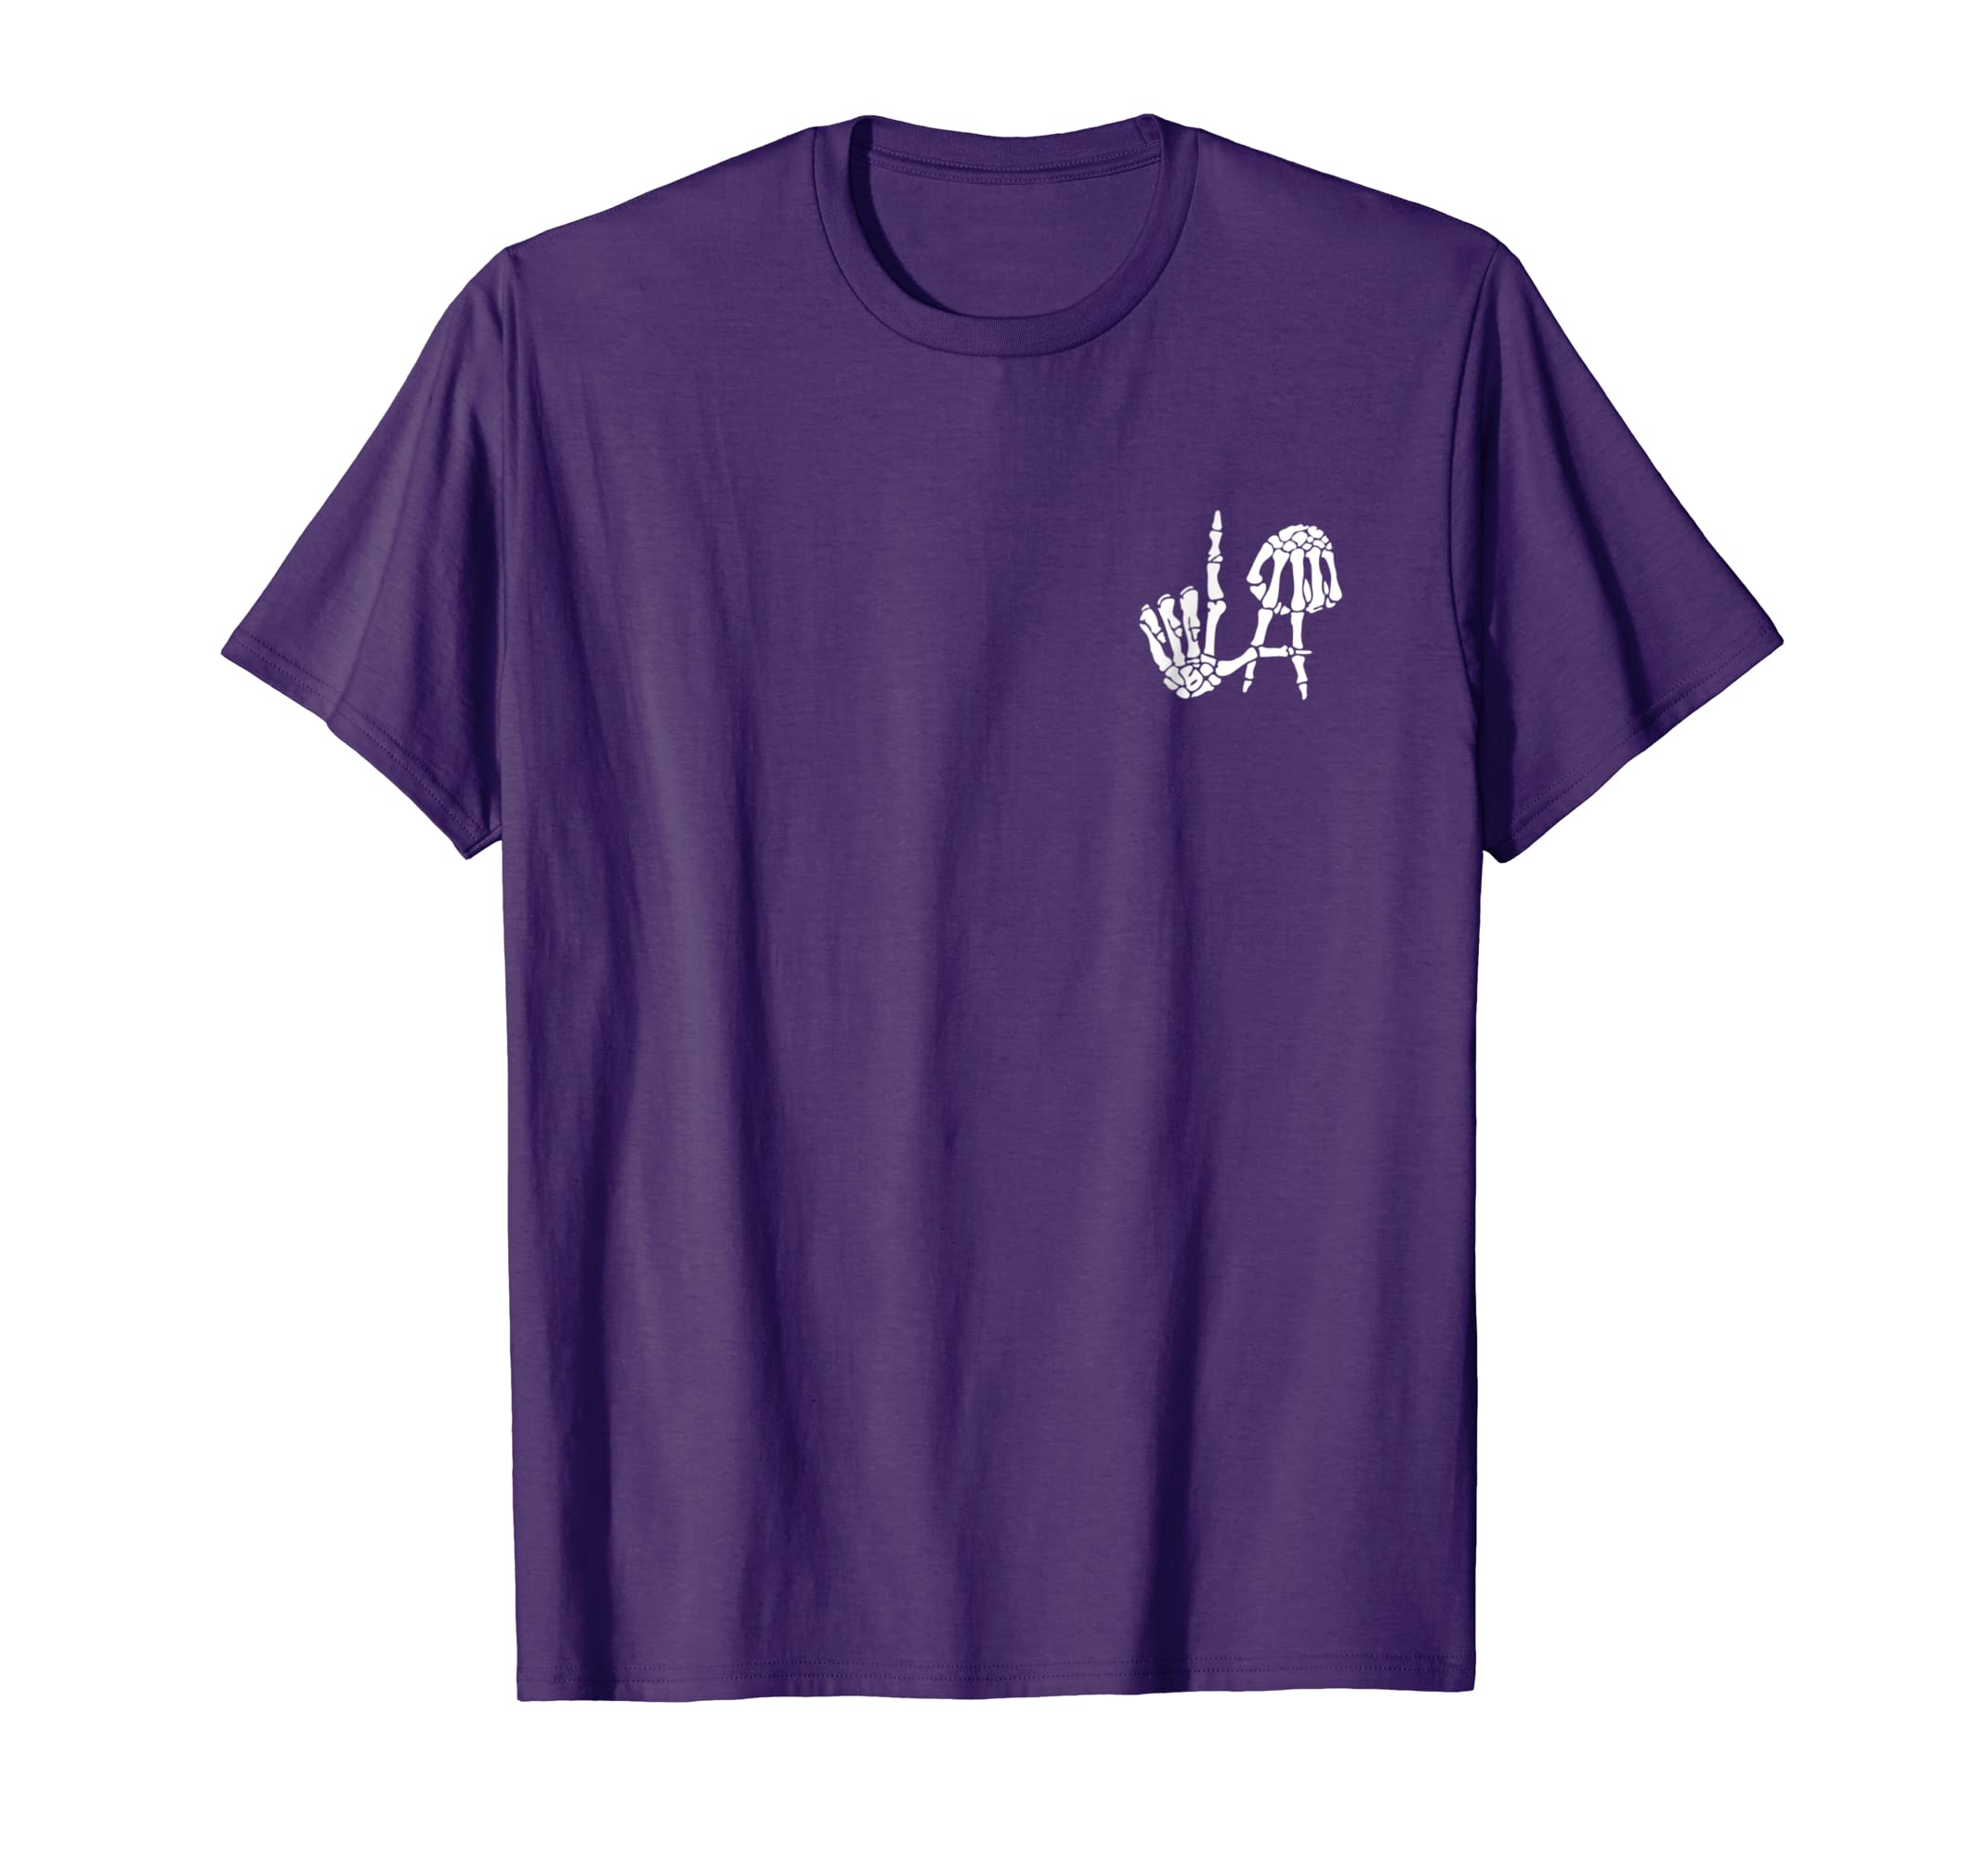 Amazon Cool Los Angeles Tshirt With Skeleton La Sign Clothing